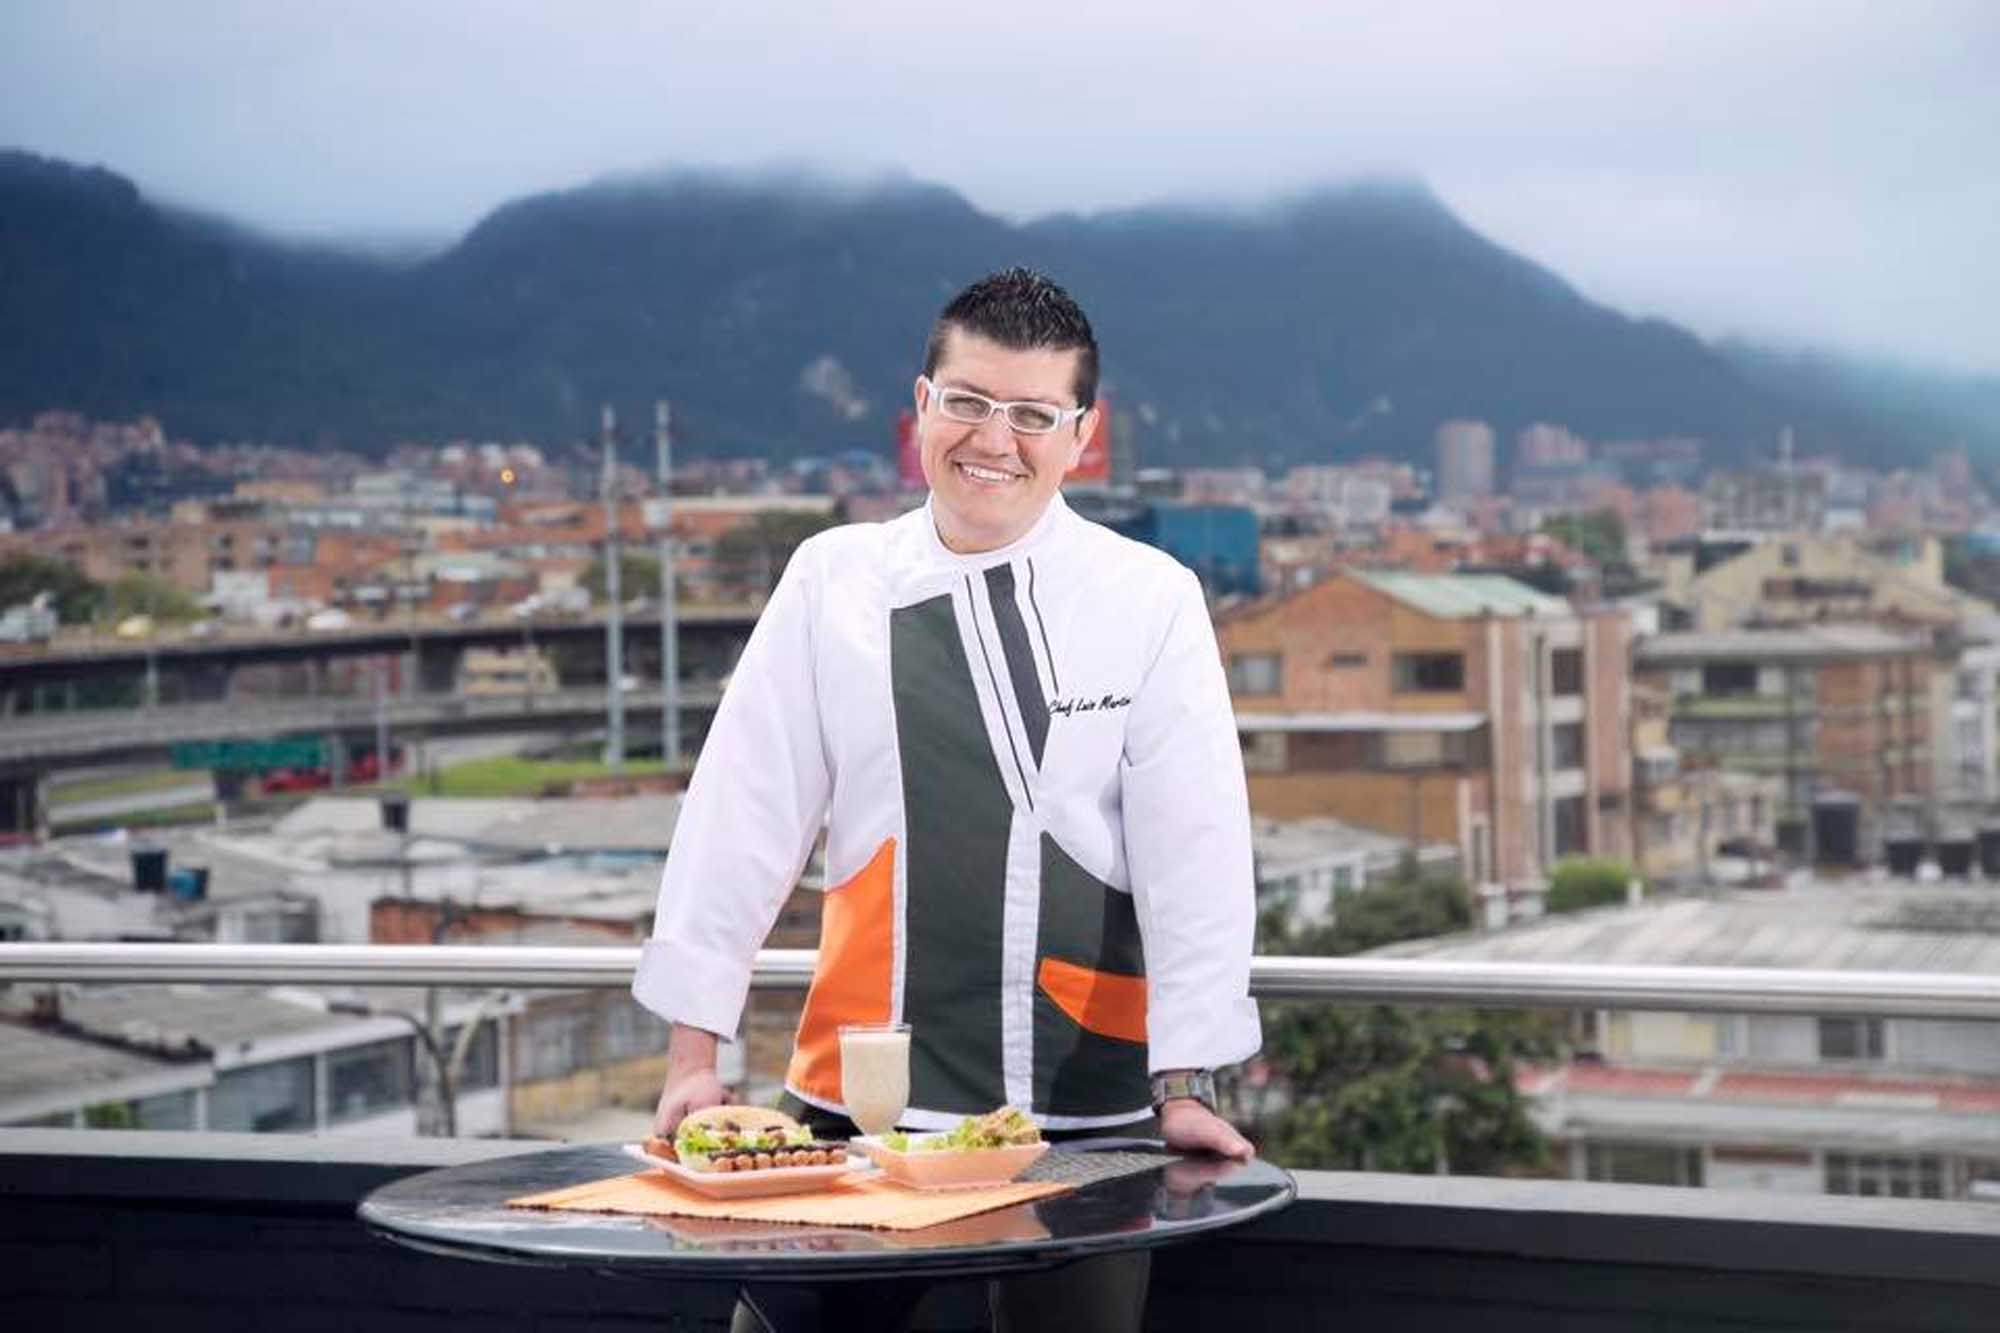 Chef Luis Ernesto Martínez Velandia 051020